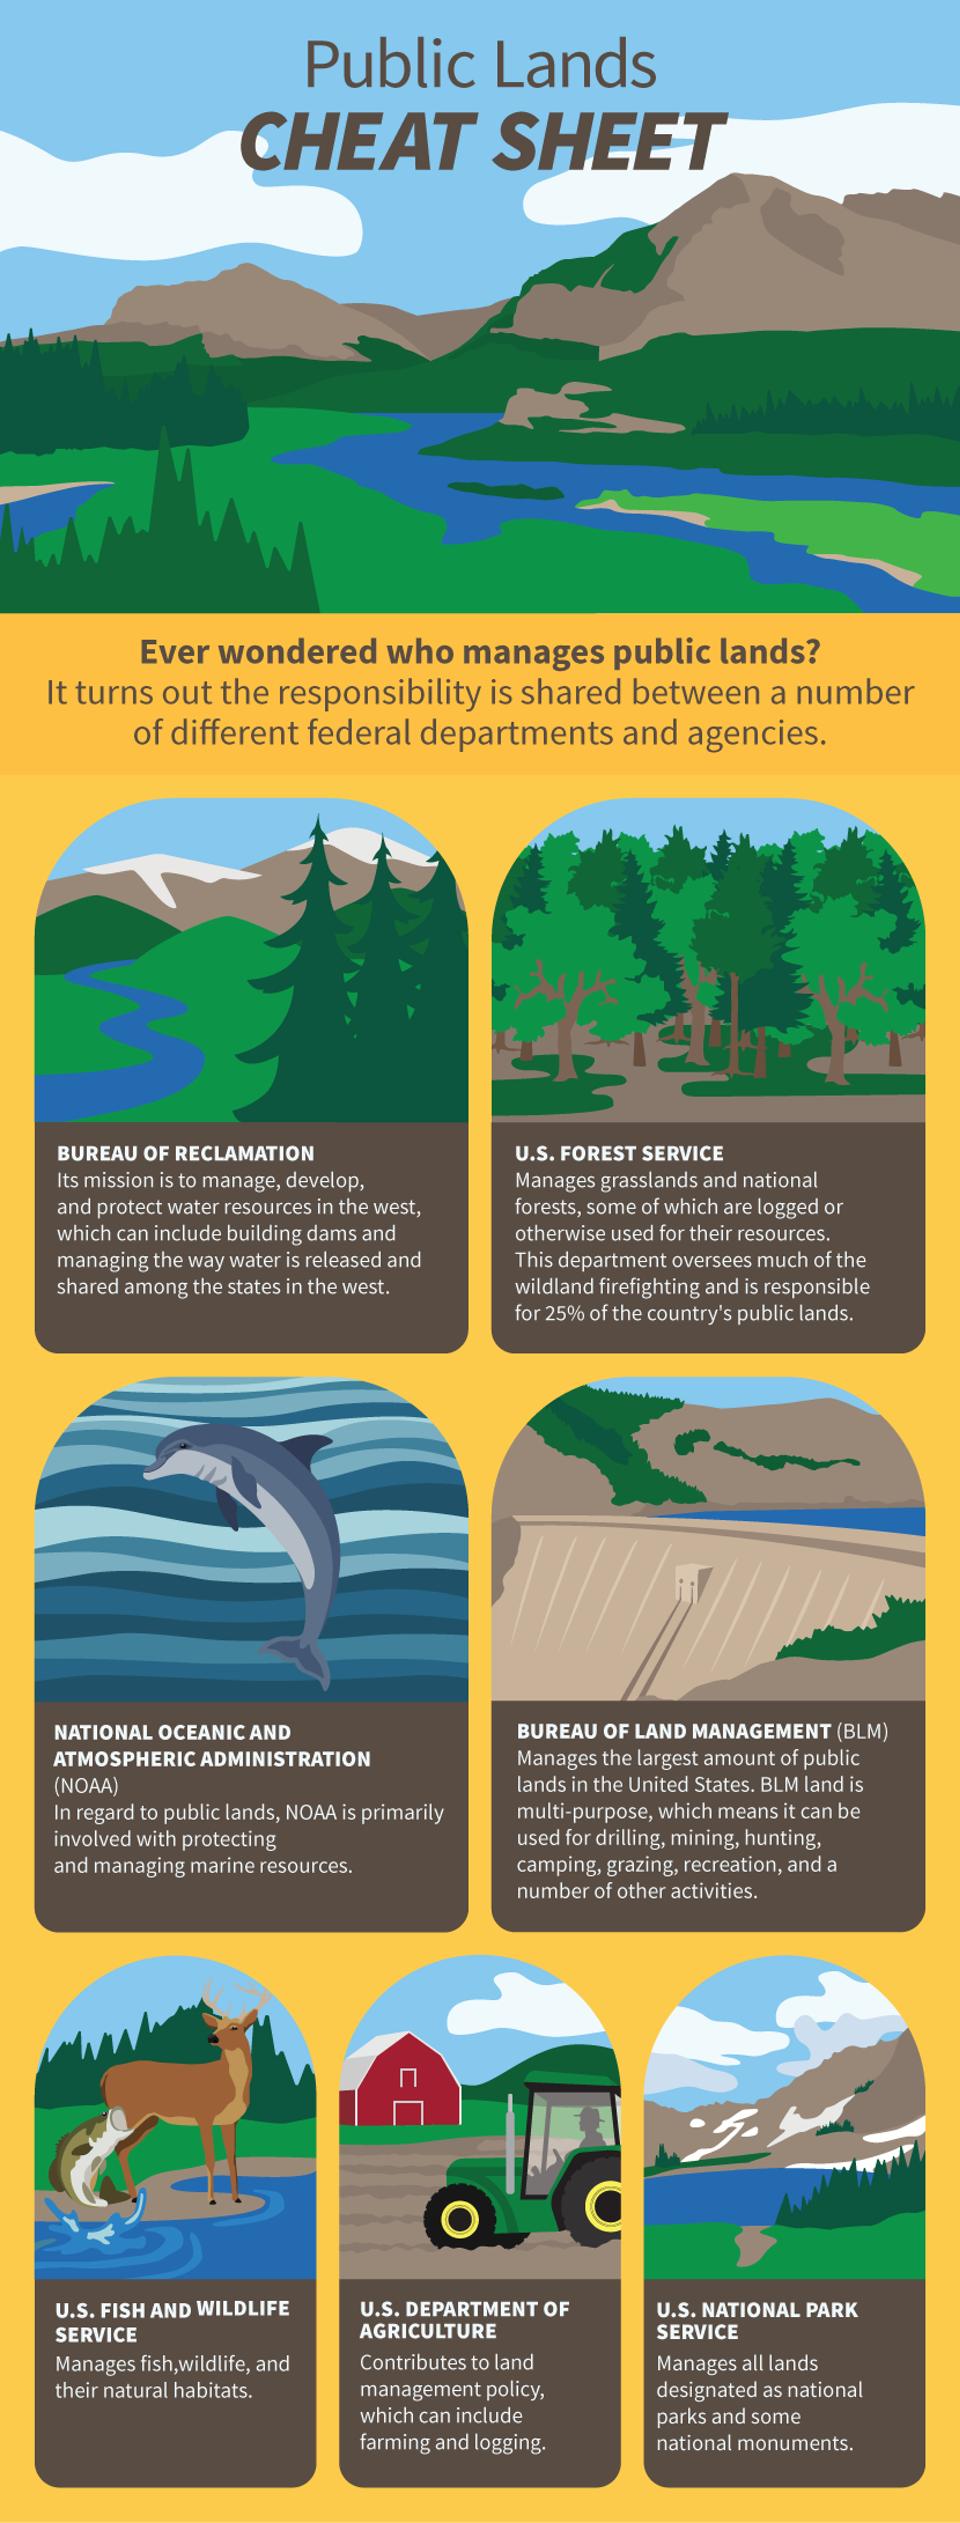 public-lands-cheat-sheet hiking trails hike wilderness wild effect